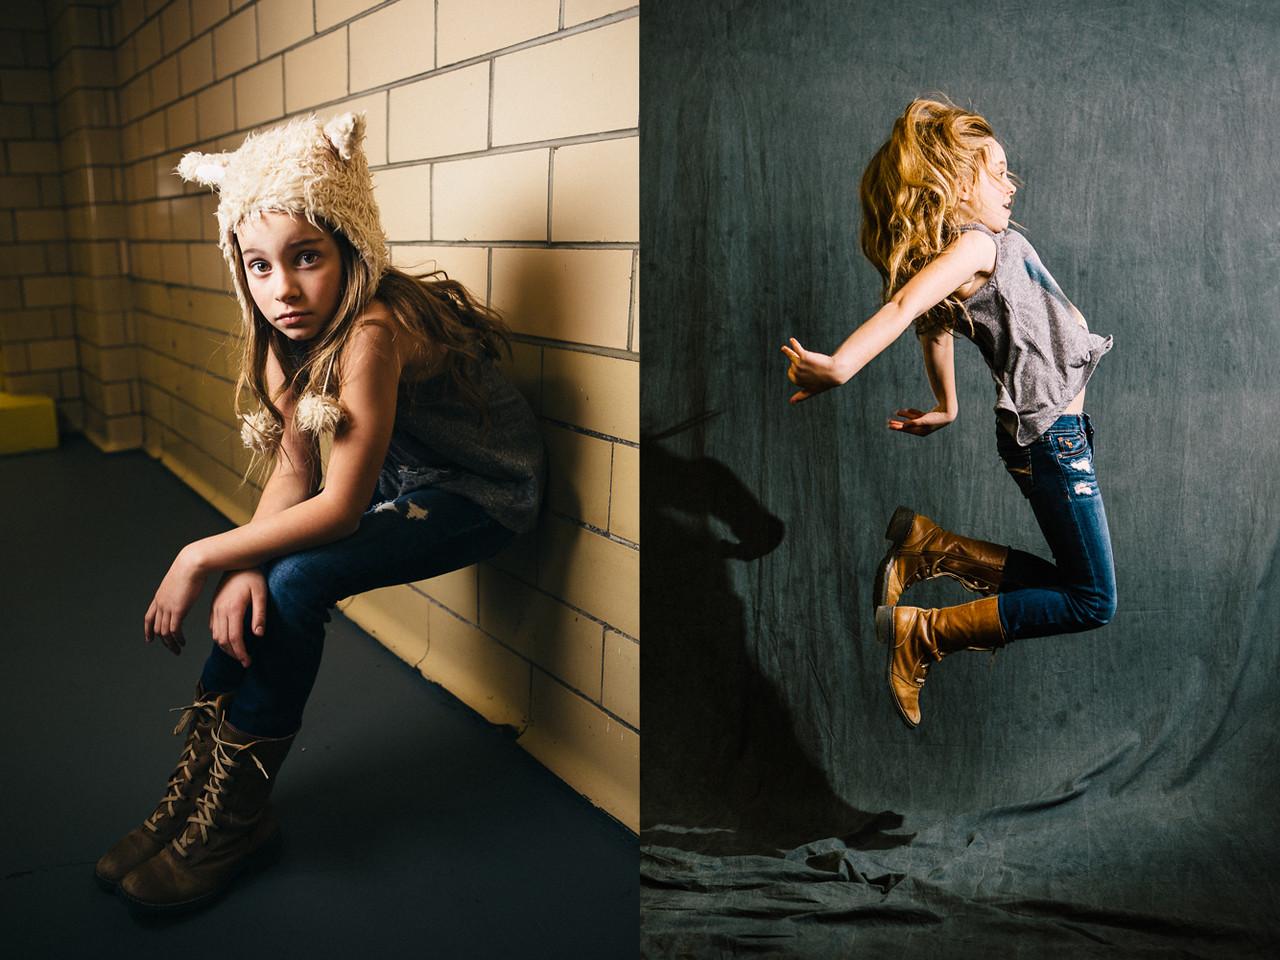 Dewitz Photography - Teslyn - Sitting Against Wall - Jumping